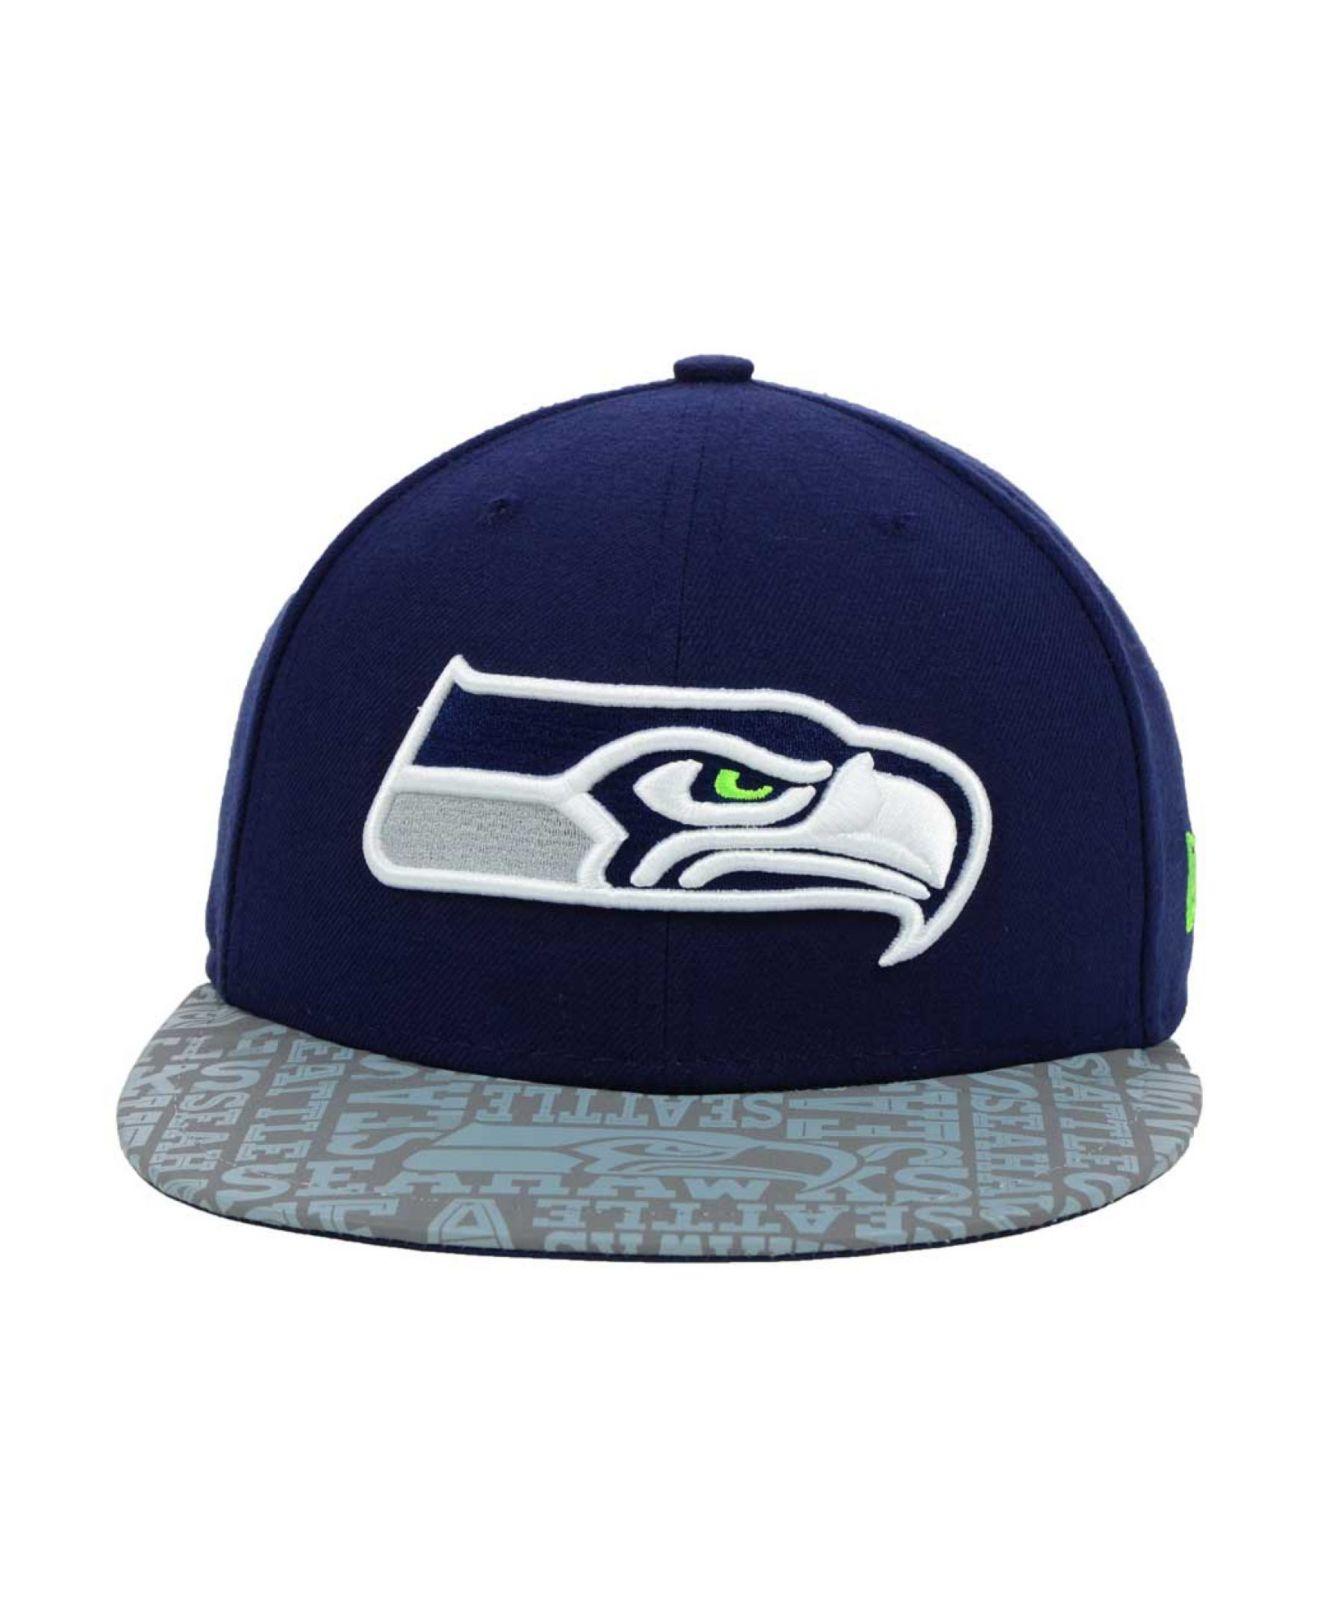 71543433e7a ... denmark wholesale lyst ktz seattle seahawks nfl draft 59fifty cap in  gray for men 6a62f 77552